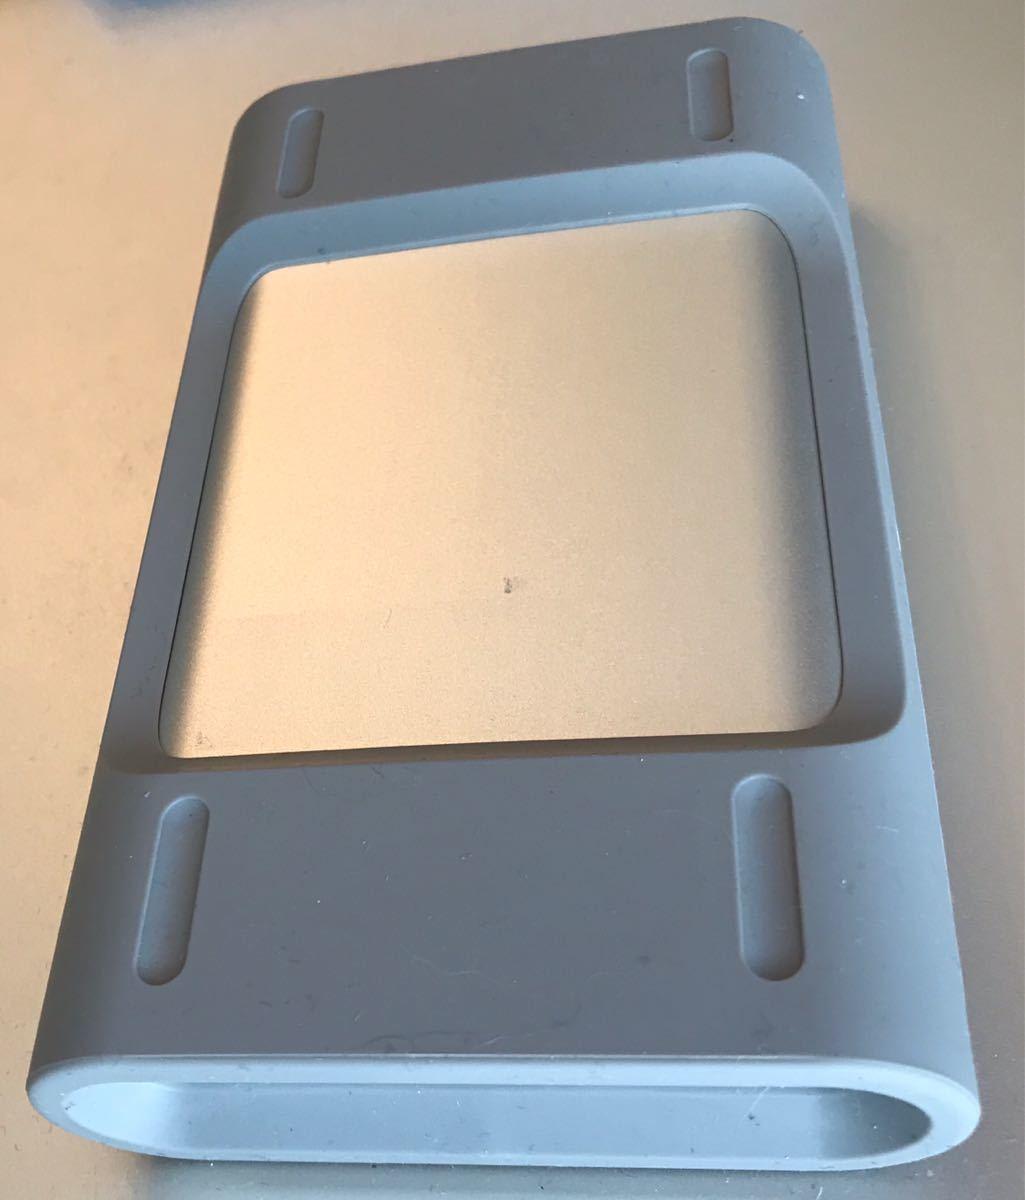 SONY モバイル FW800 USB3.0  500GB PSZ-HA50